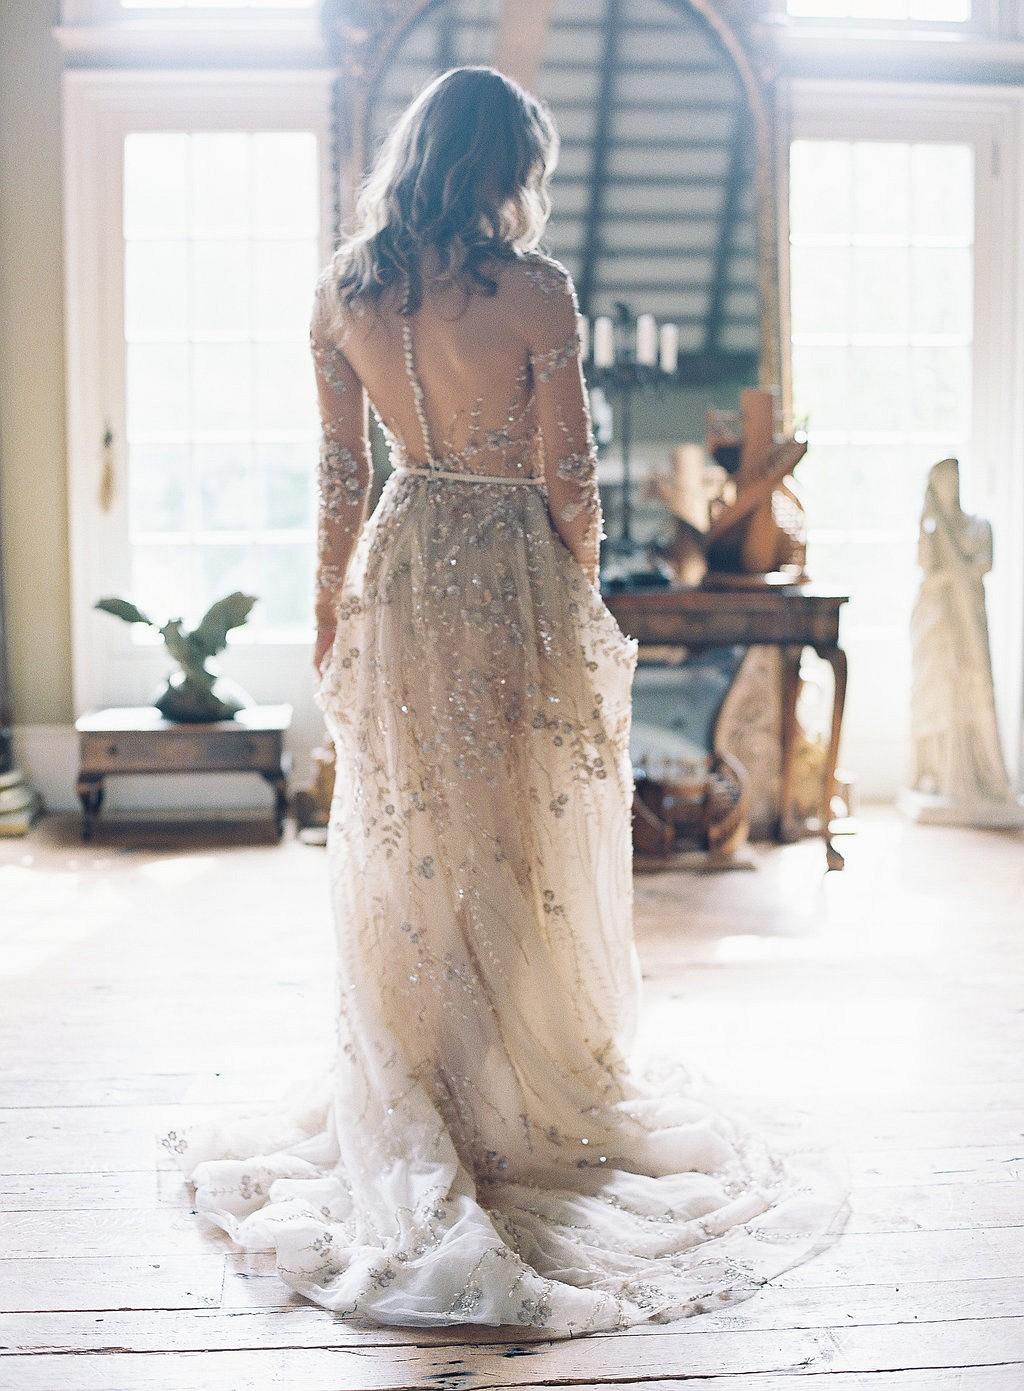 Bella Belle Luxury Wedding Shoes with Joy Proctor